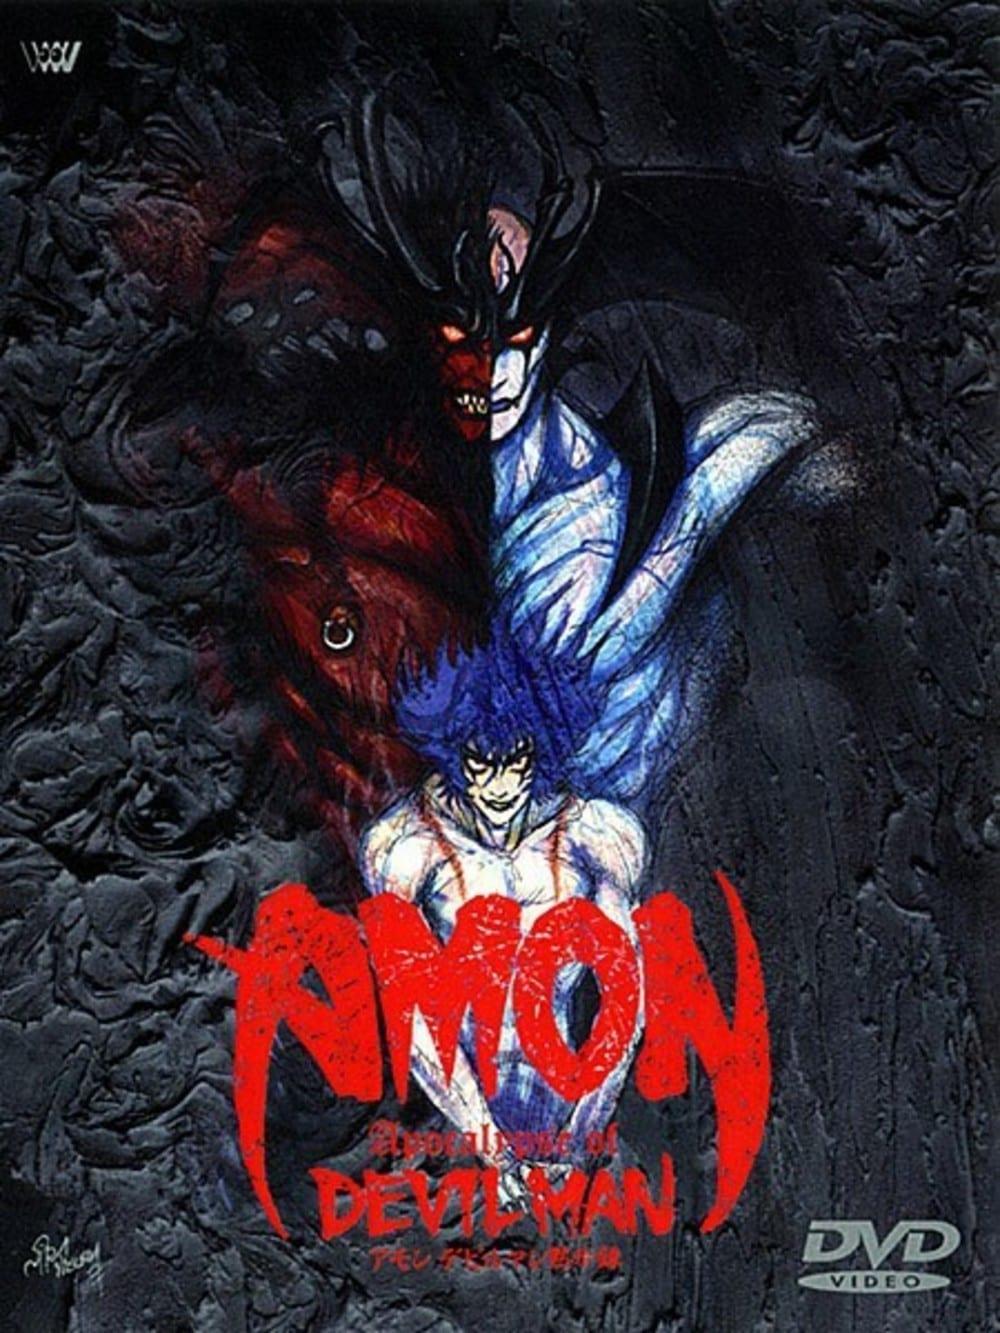 https://mirai.ai/wp-content/uploads/Amon-Devilman-Mokushiroku-1.jpg